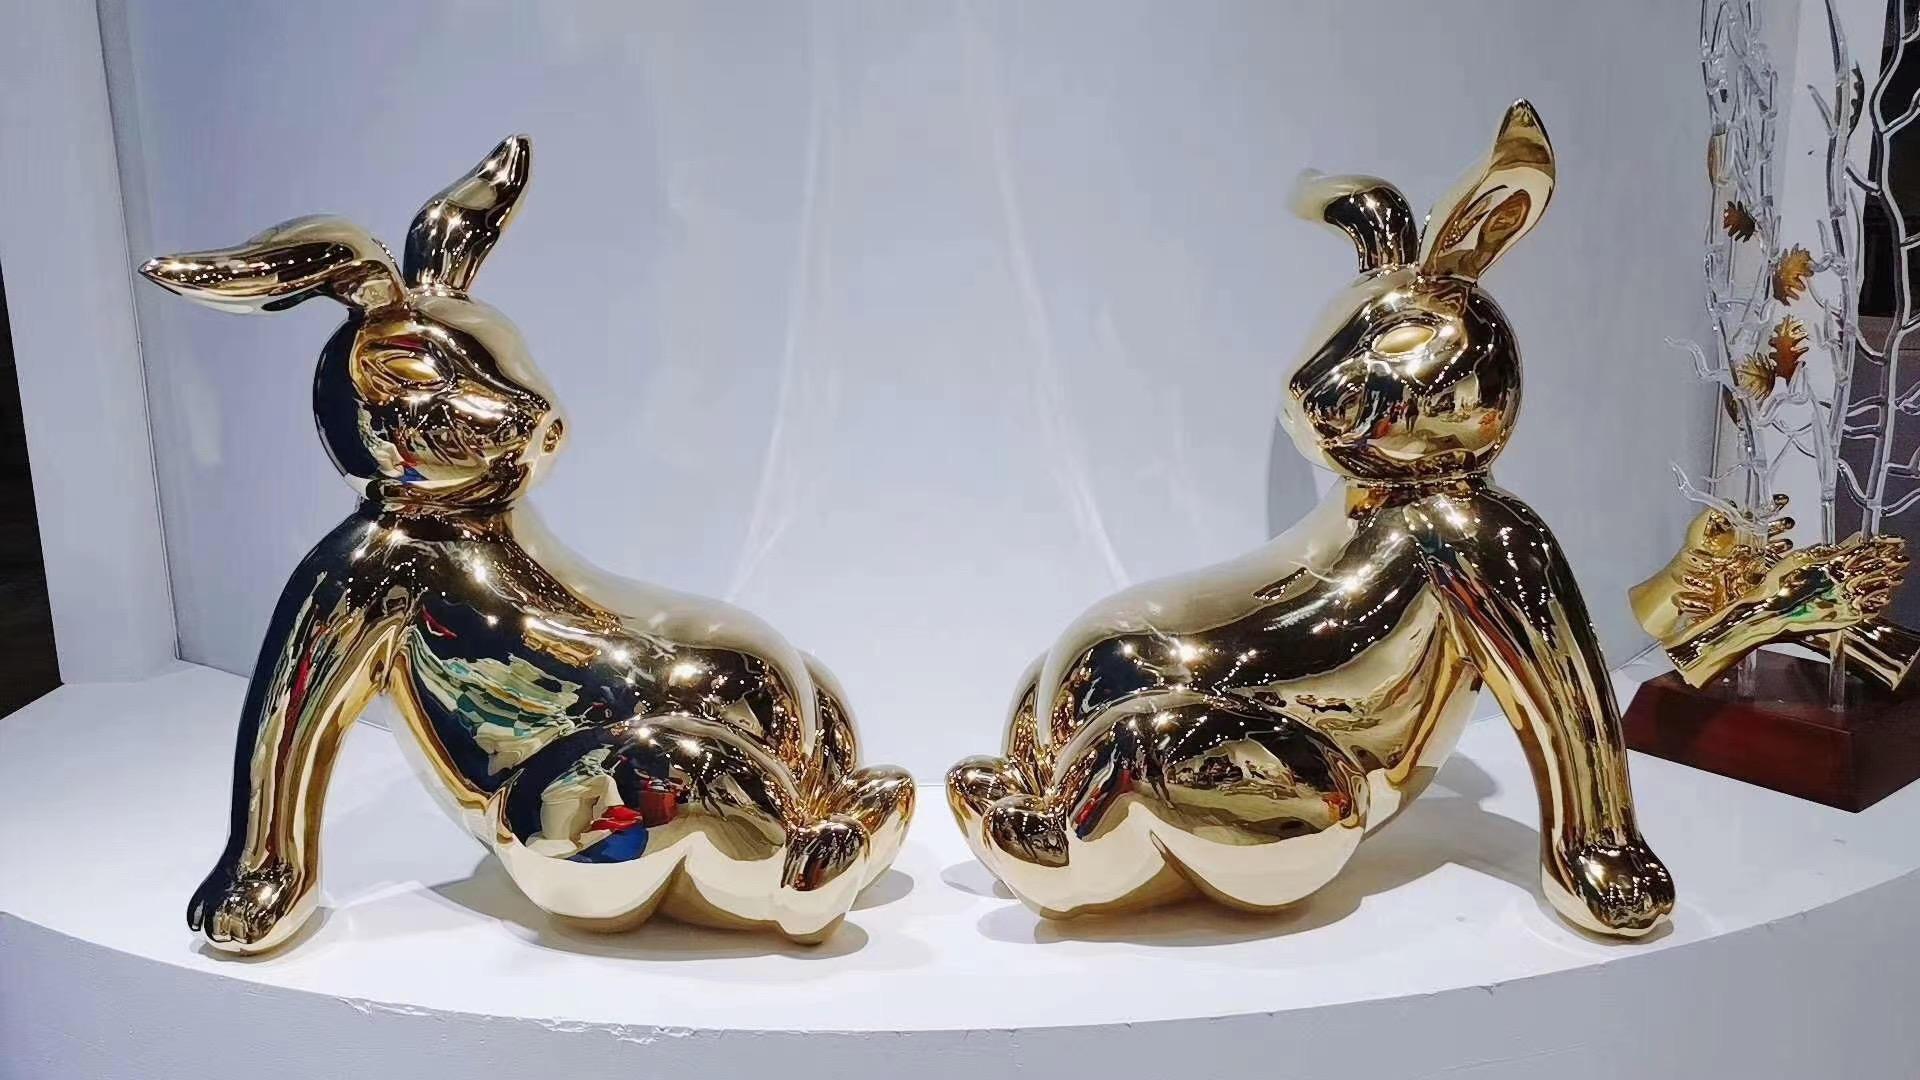 customized metal rabbit display in market showroom